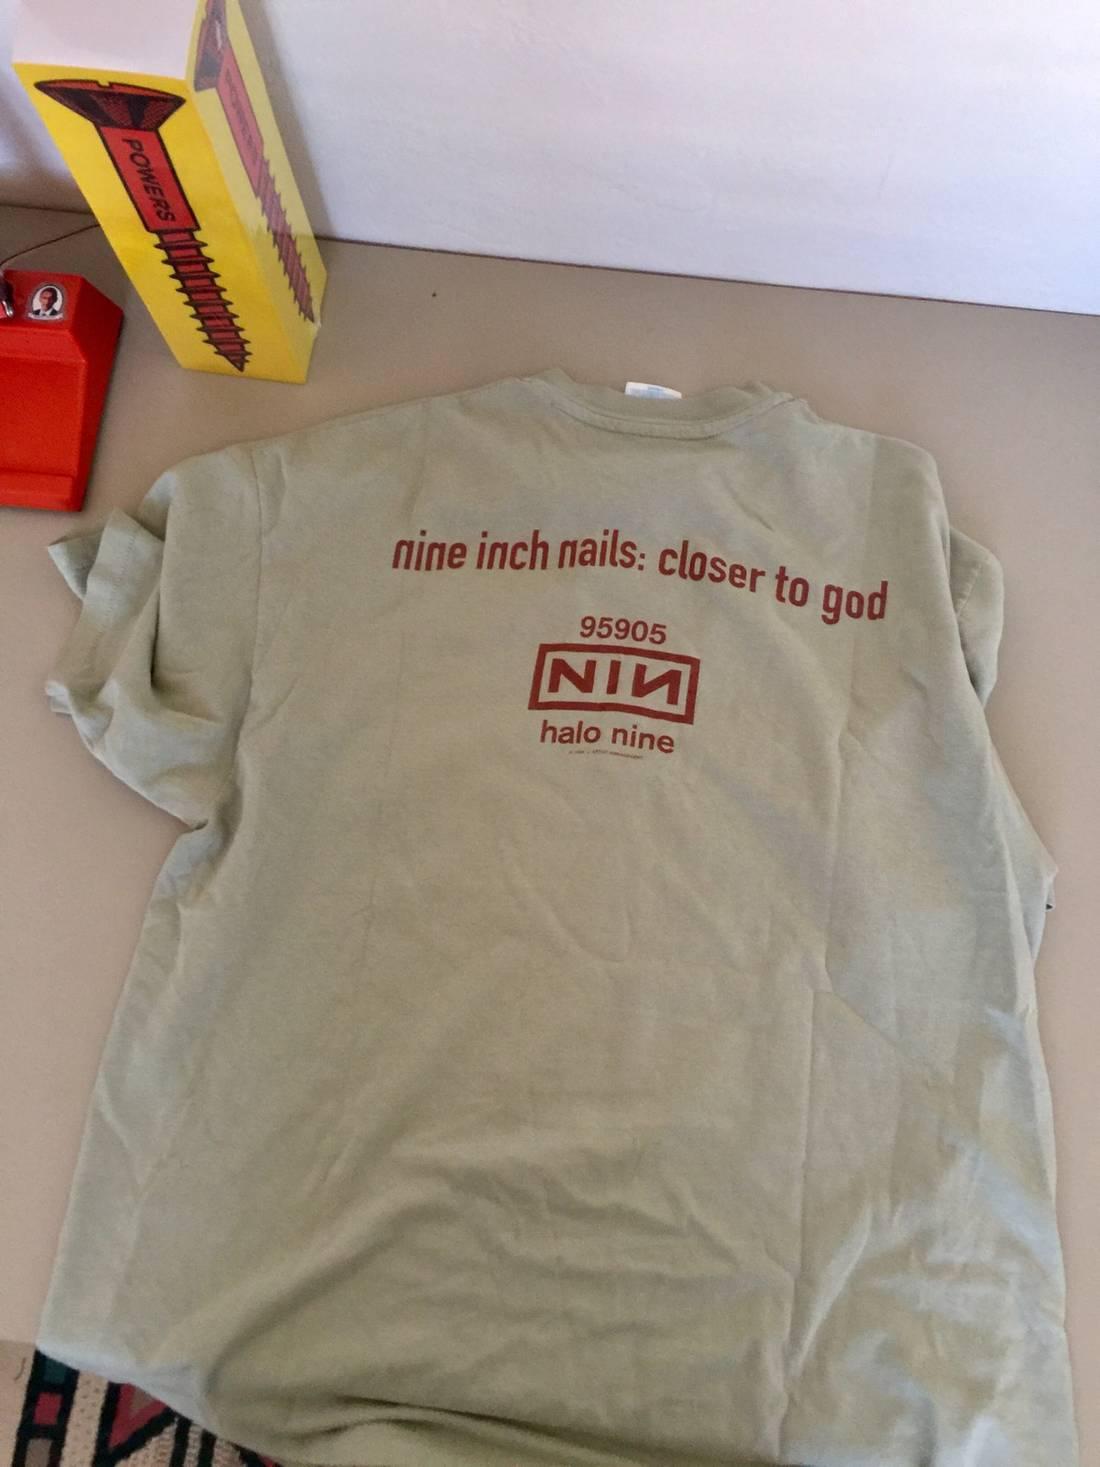 Enchanting Nine Inch Nails Closer Crest - Nail Art Ideas - morihati.com